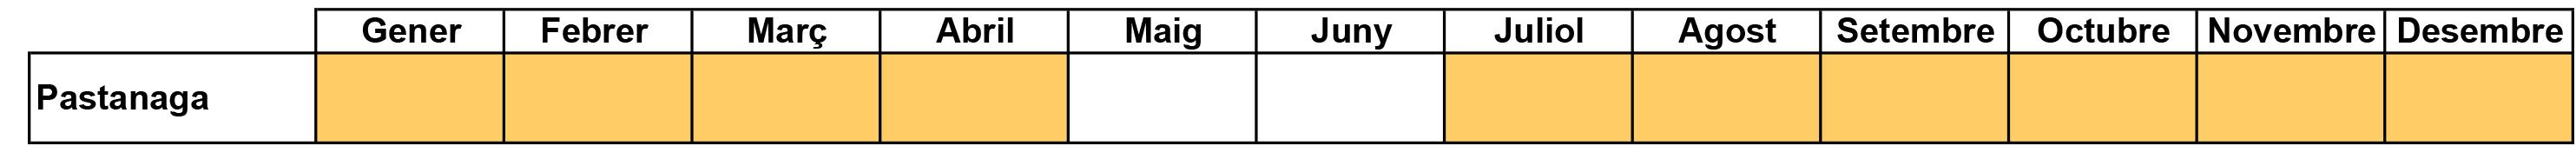 01-Calendari Pastanaga